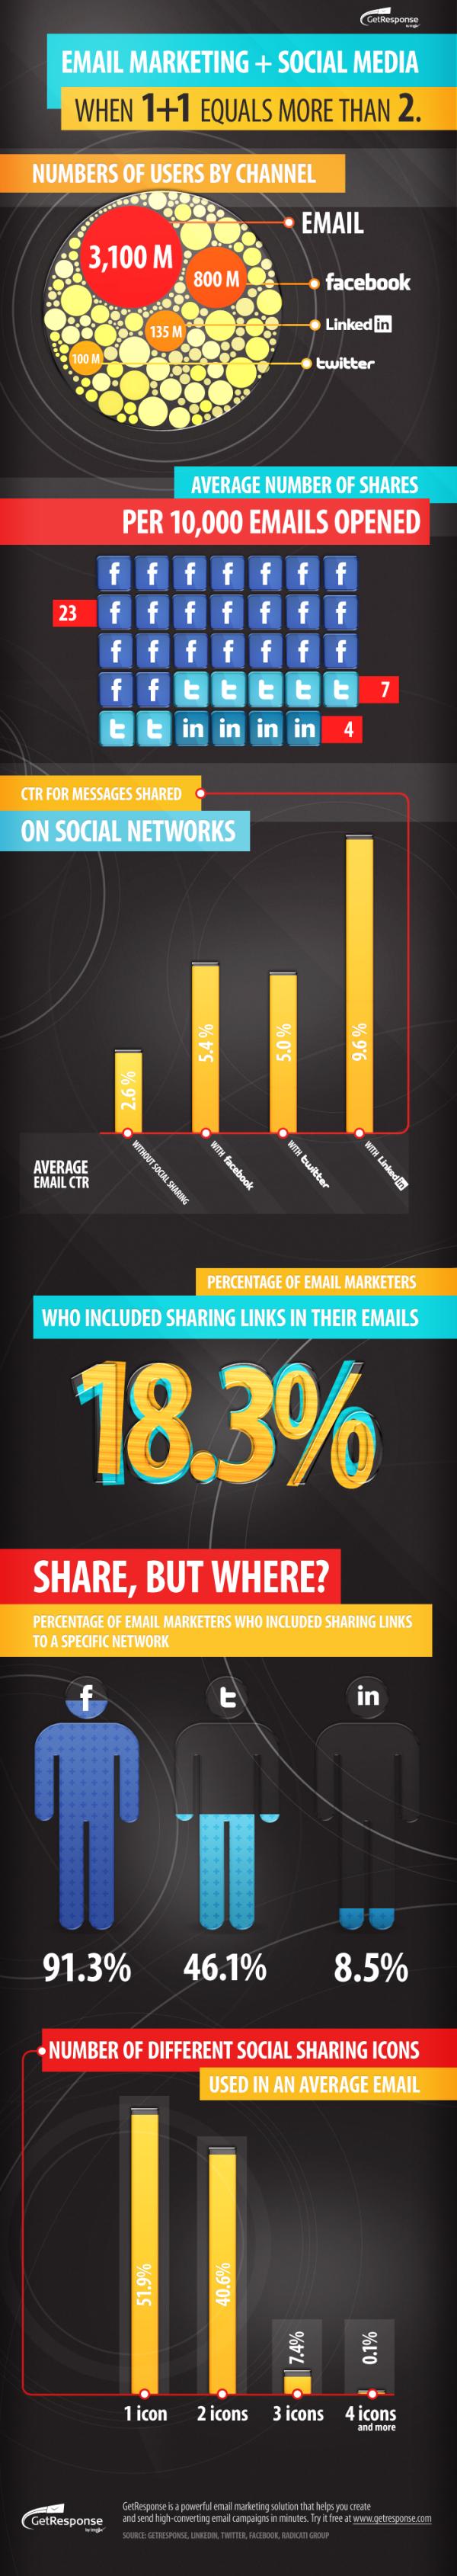 infographic socialmedia 61 resized 600